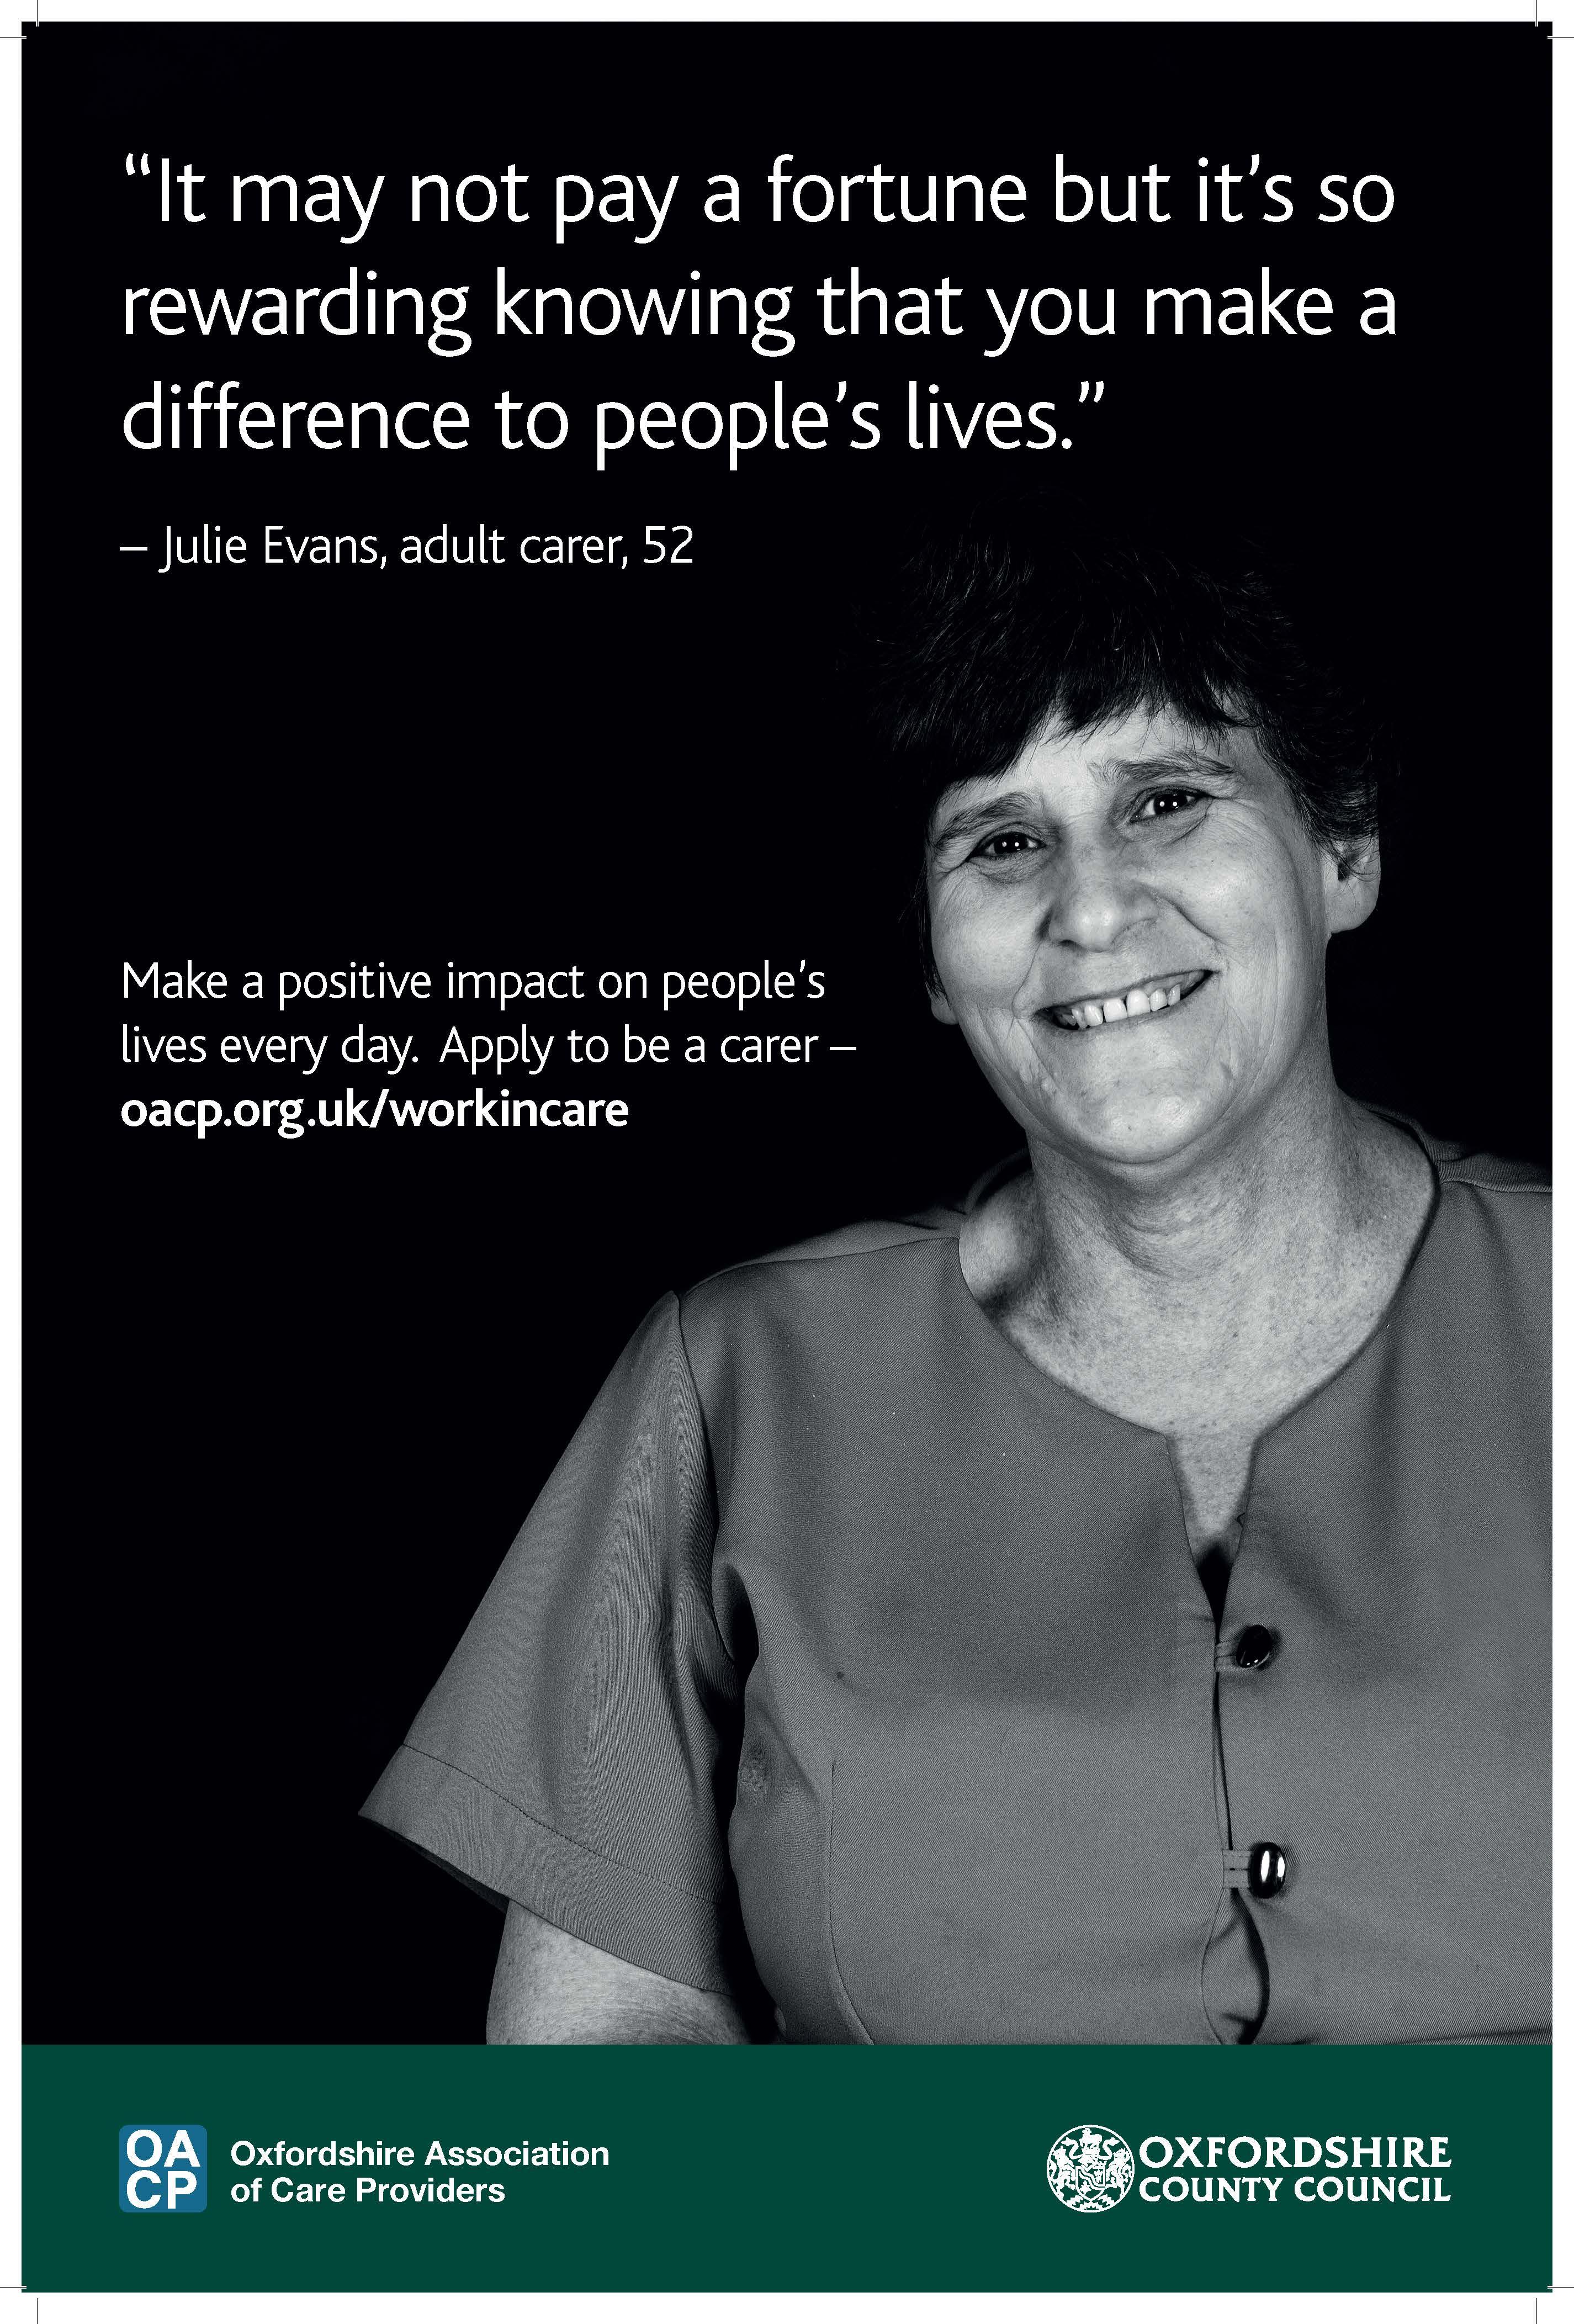 Workforce promotion poster